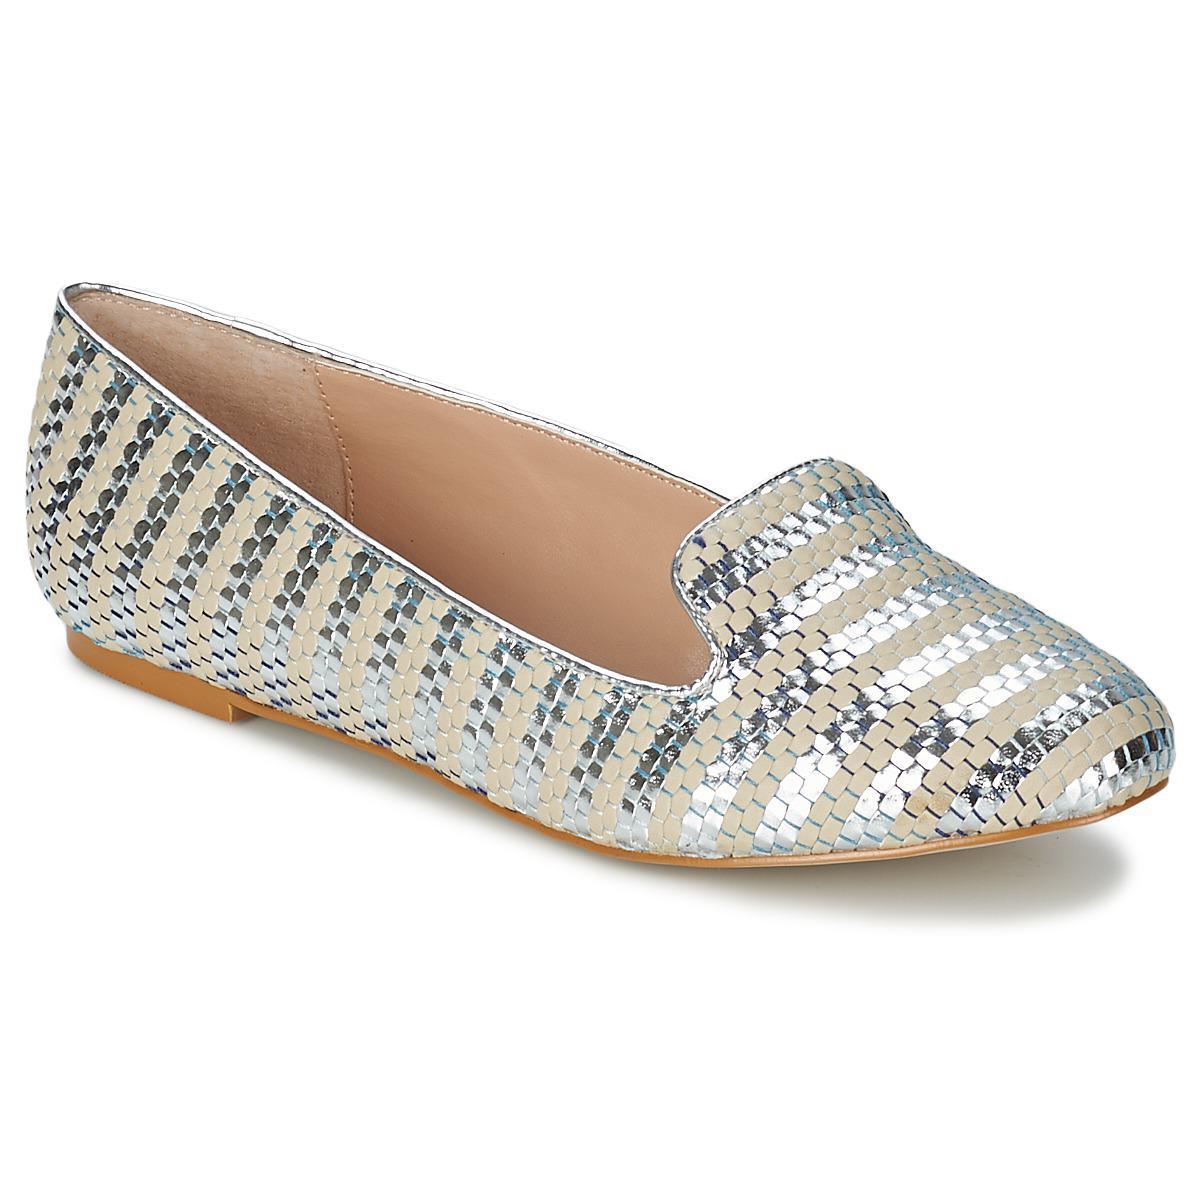 77d3379de50 Carvela Kurt Geiger Lychee Shoes (pumps   Ballerinas) in Metallic - Lyst